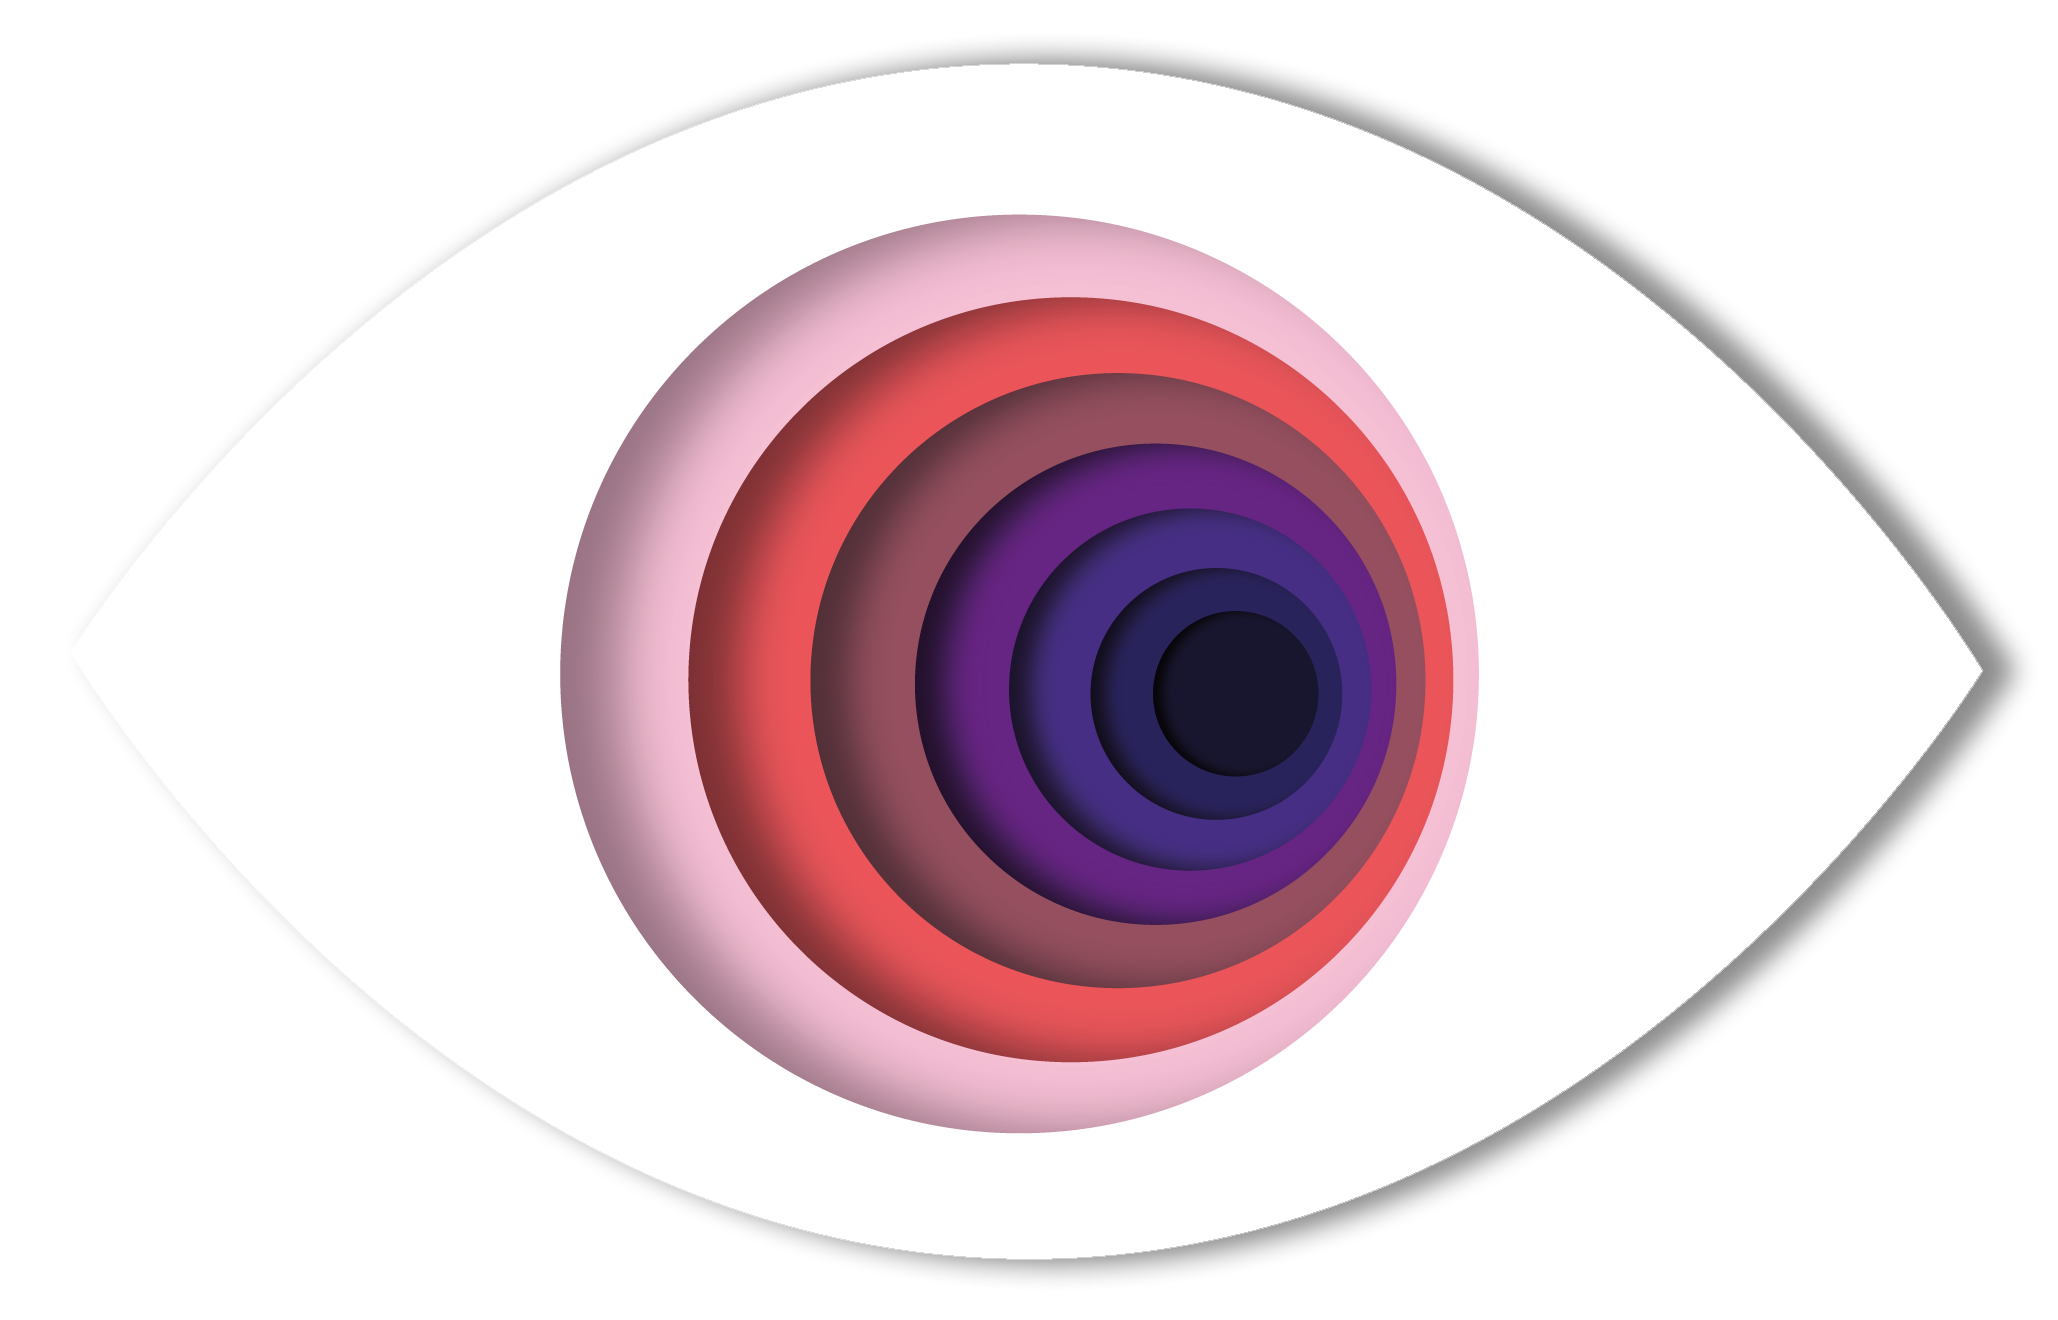 Curious Festival branding element: Eye